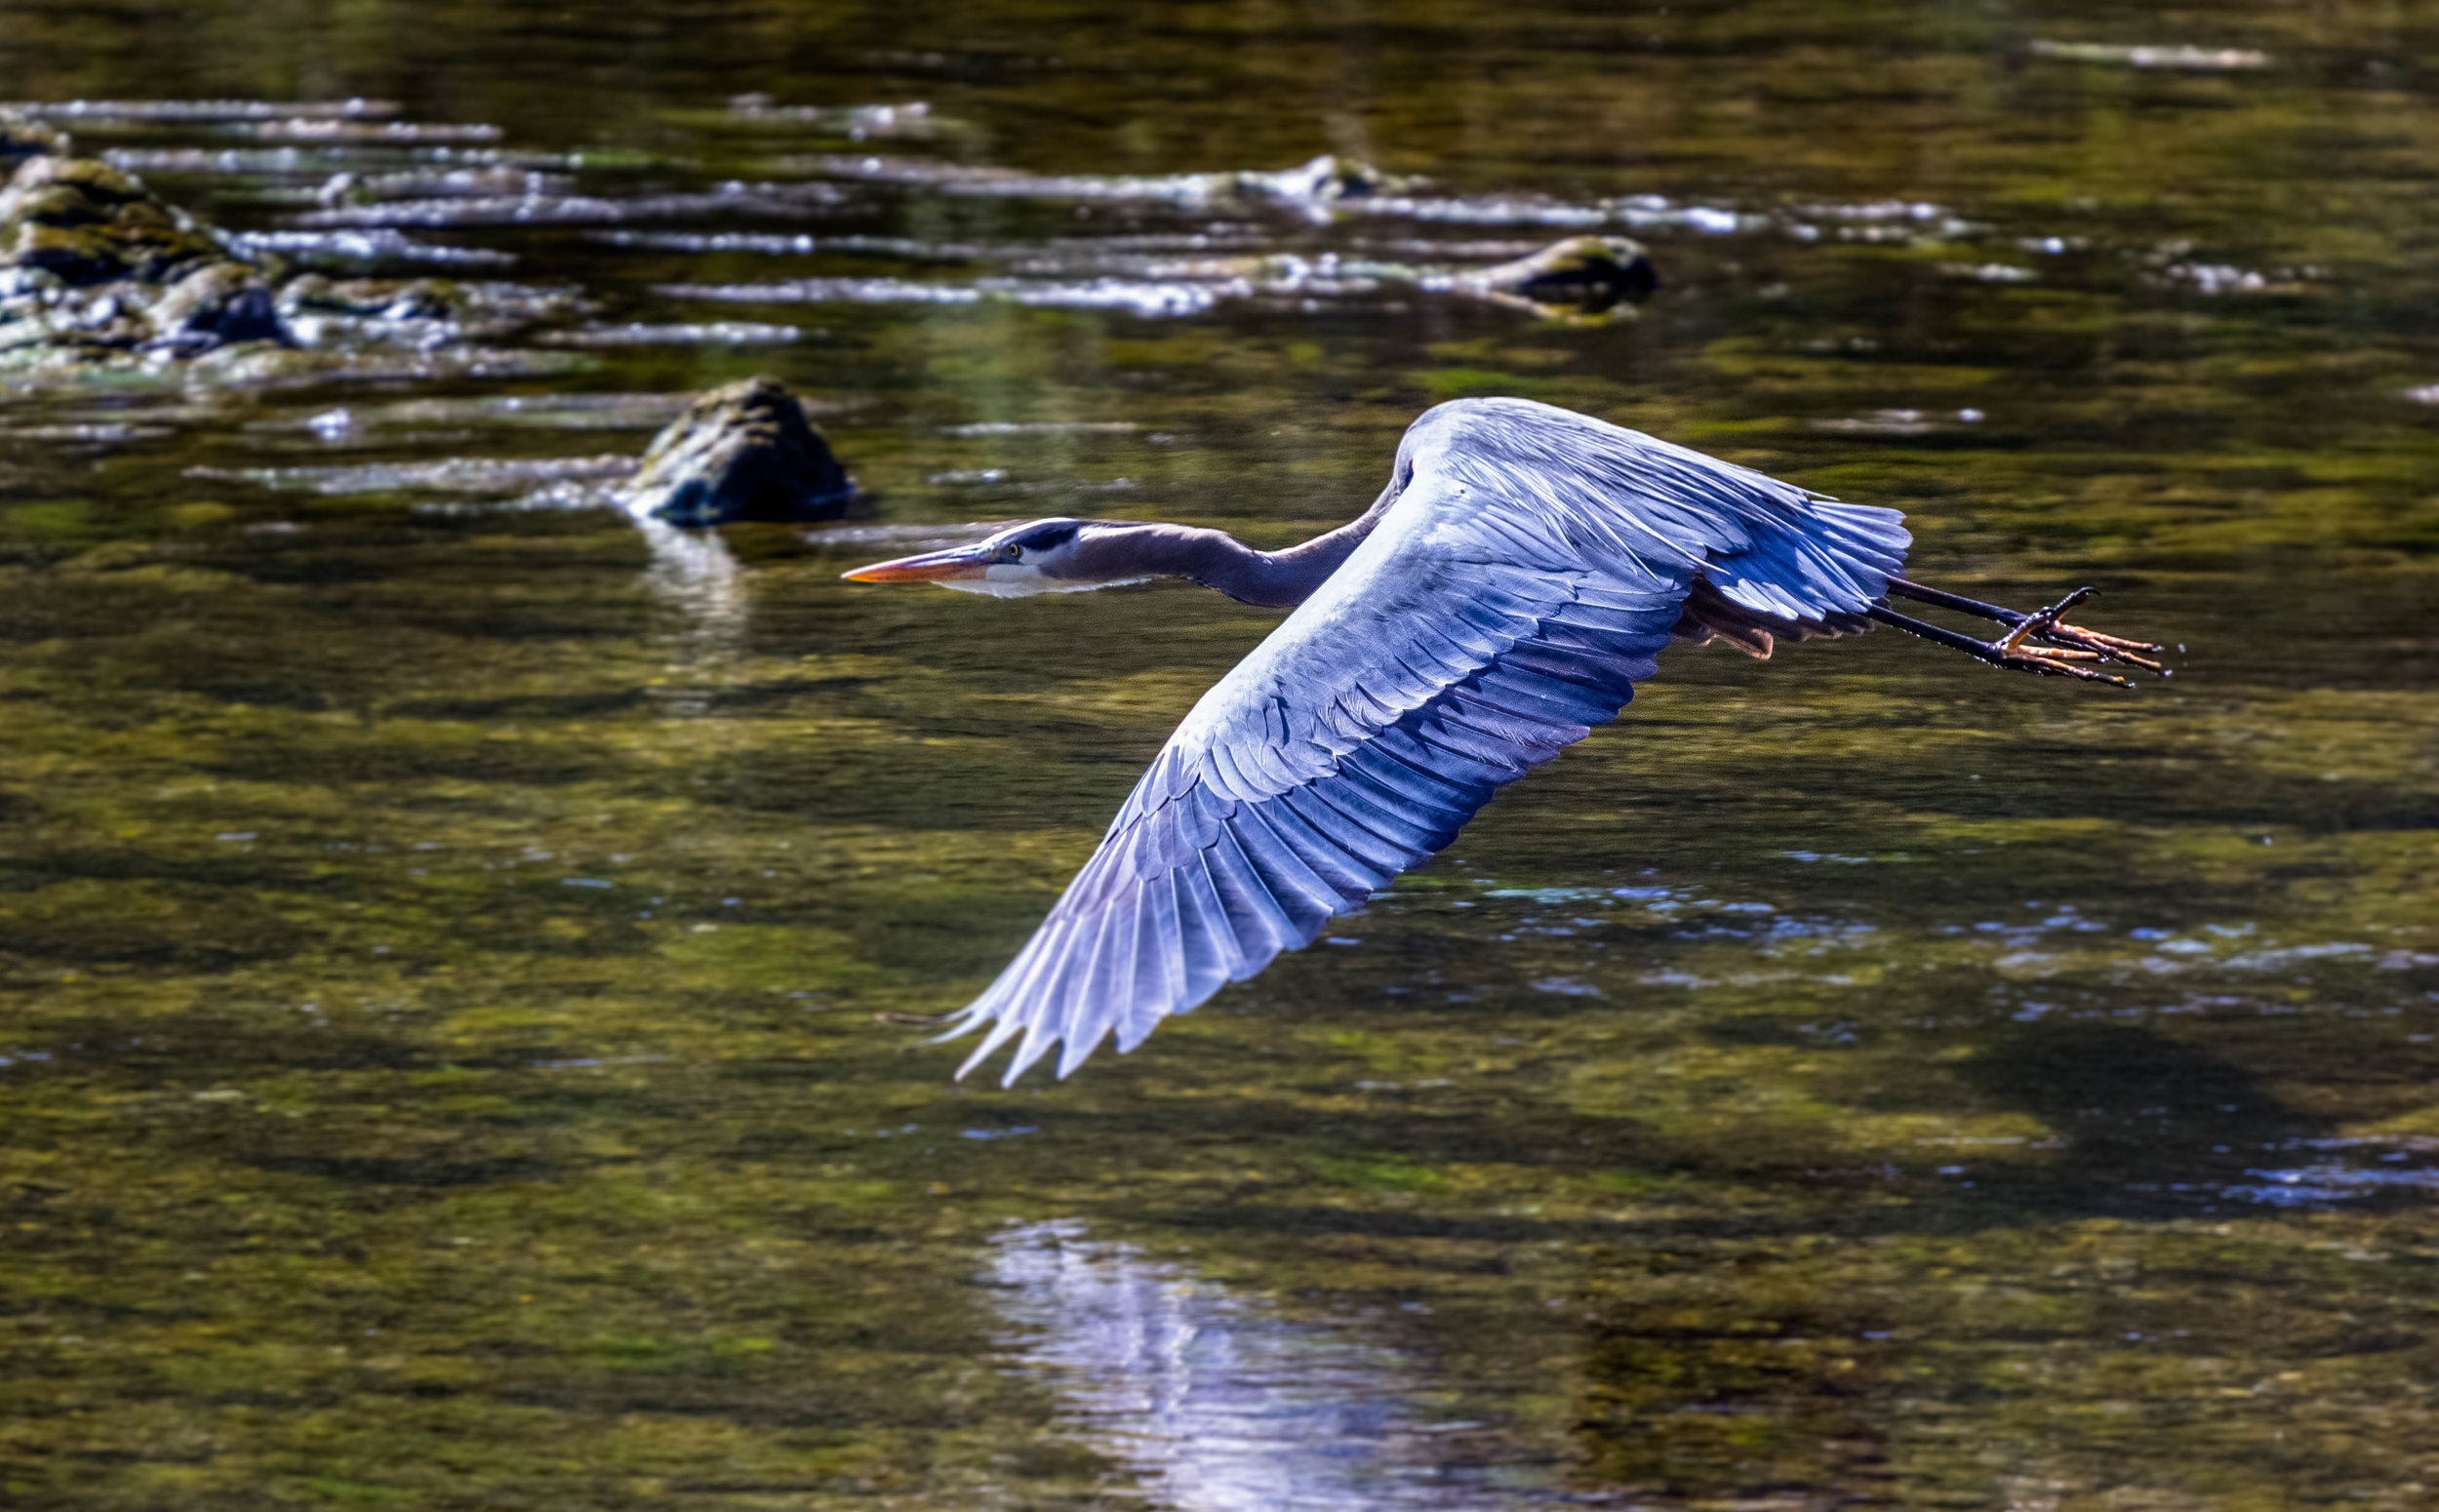 Blue Heron near Norris Dam State Park, Tennessee